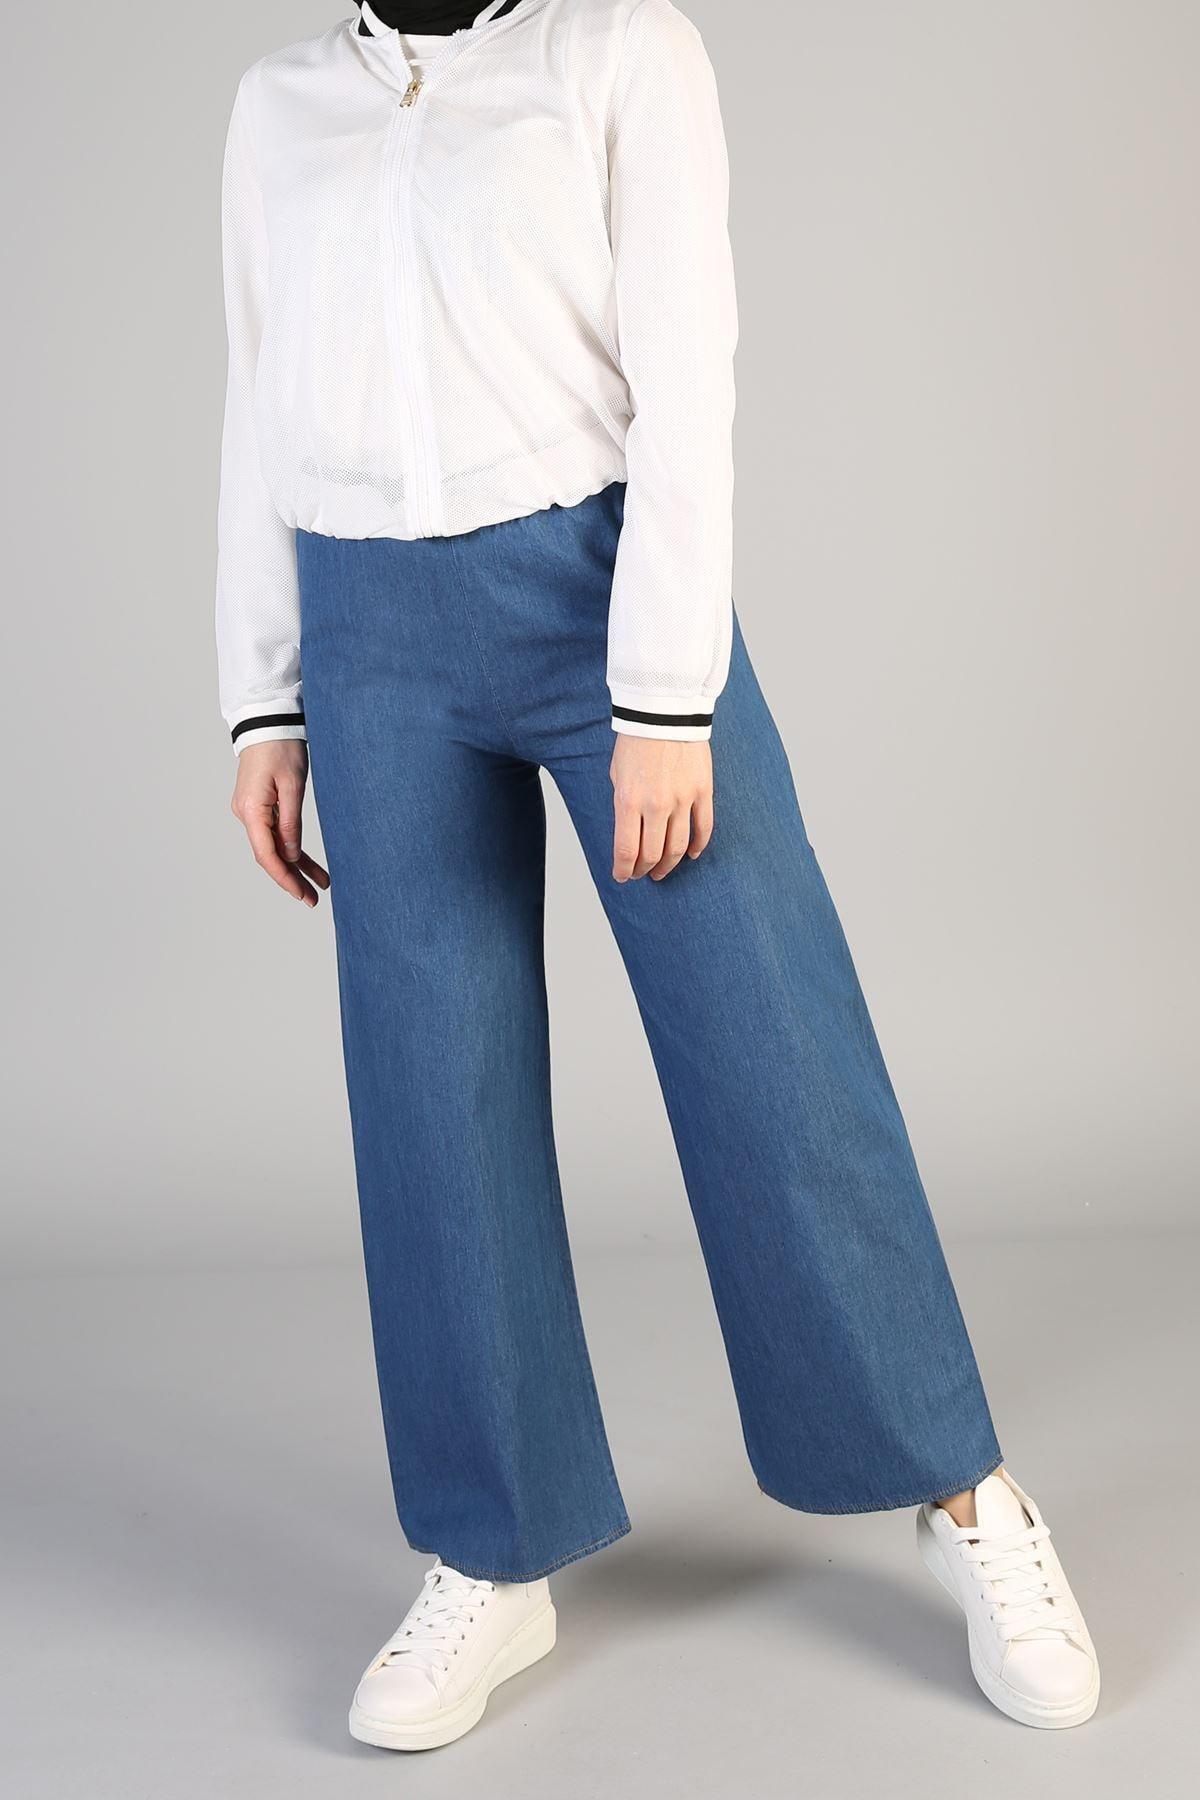 Kadın Mavi Lastikli Bol Pantolon